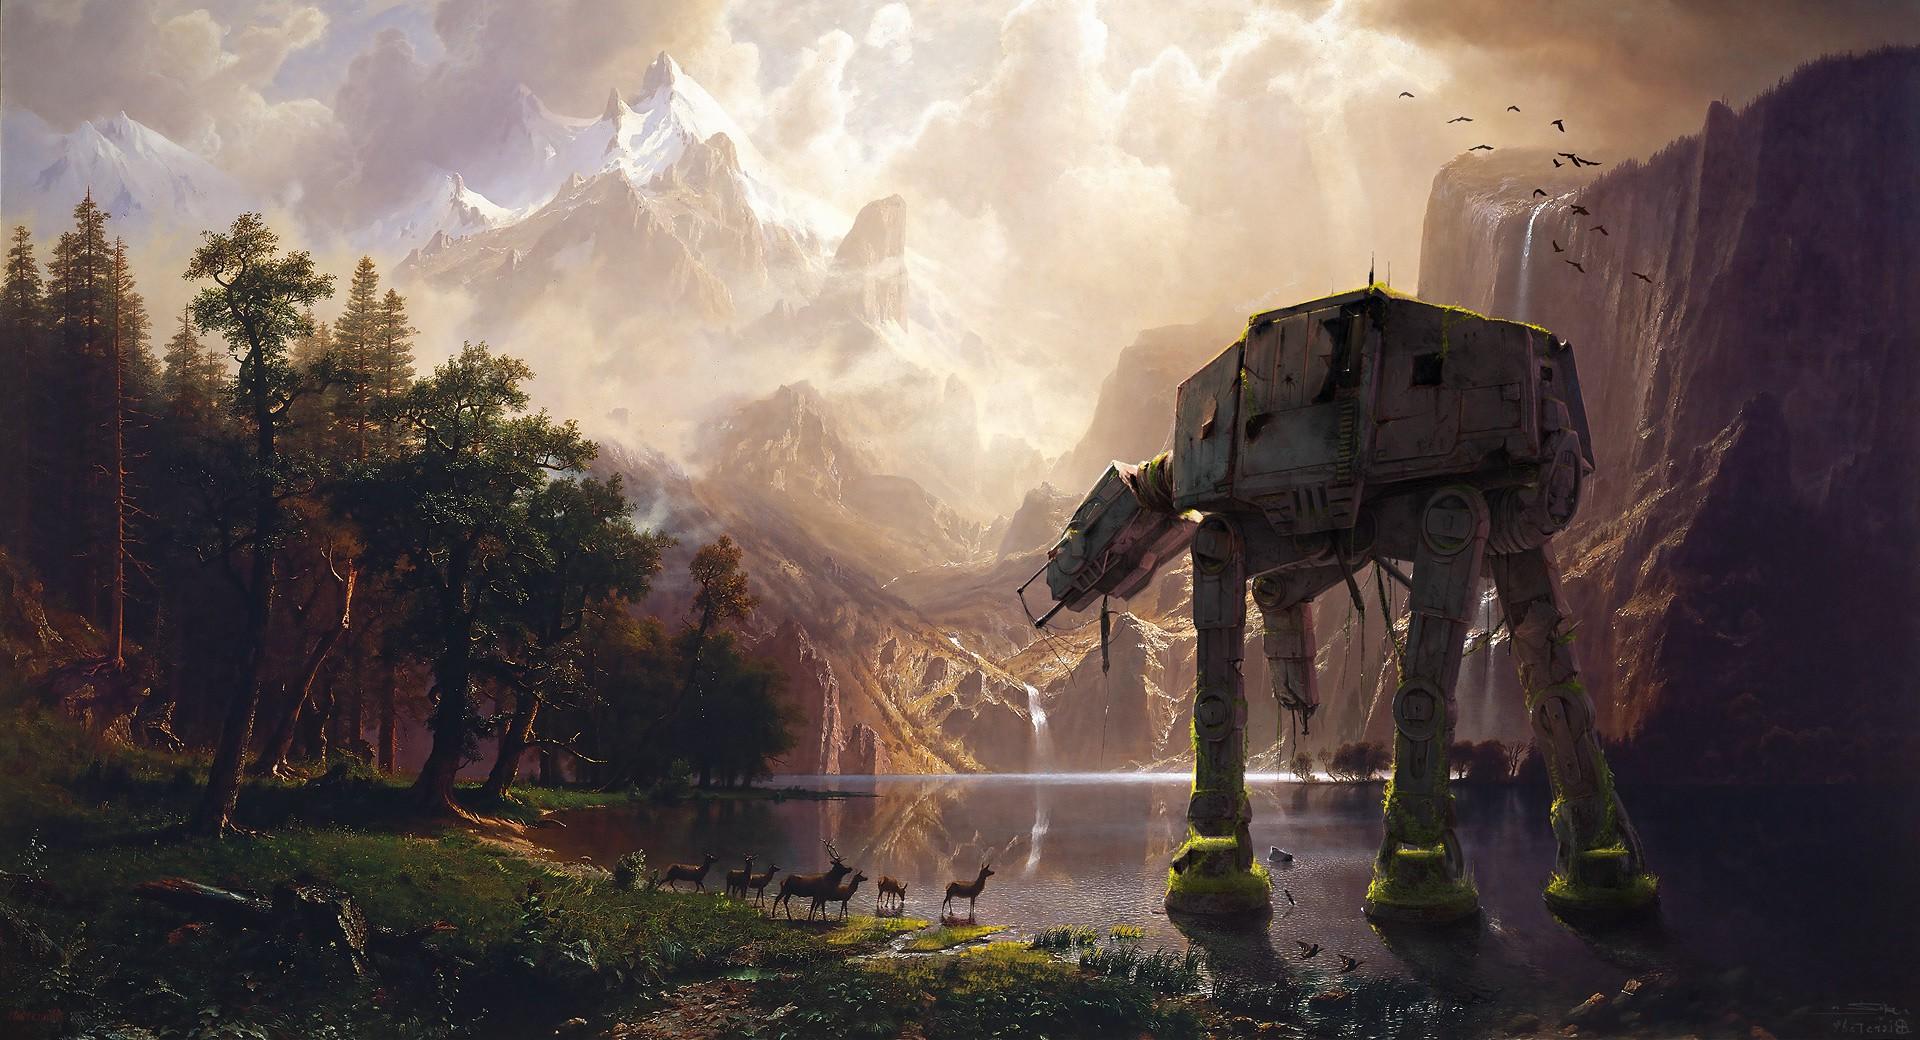 Star Wars Wallpaper - Best HD Wallpaper